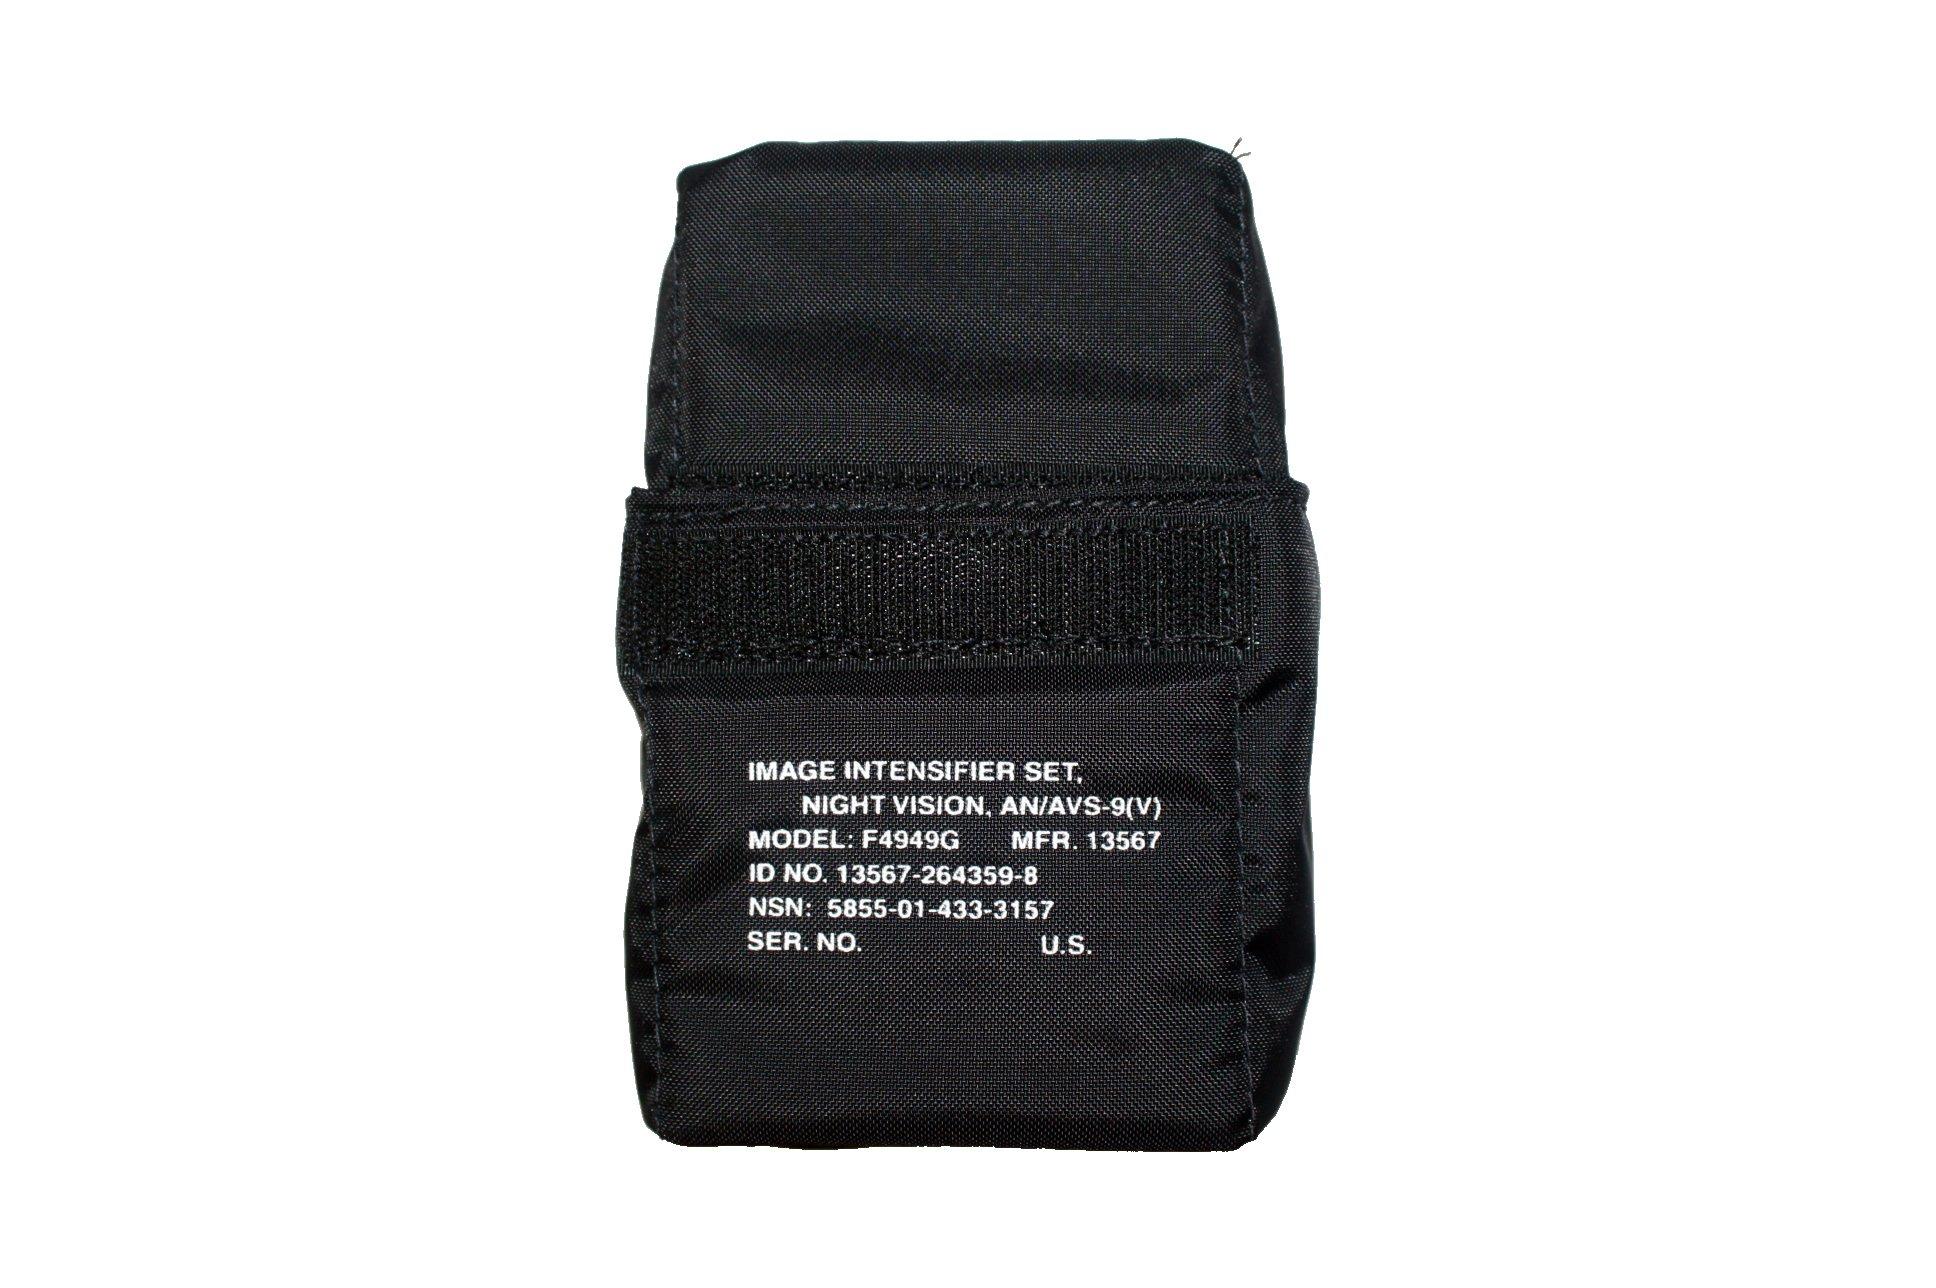 AN/AVS-9(V) F4949G ANVIS Night Vision Goggle NVG Black Carrying Case w/ Foam Cushion by ITT